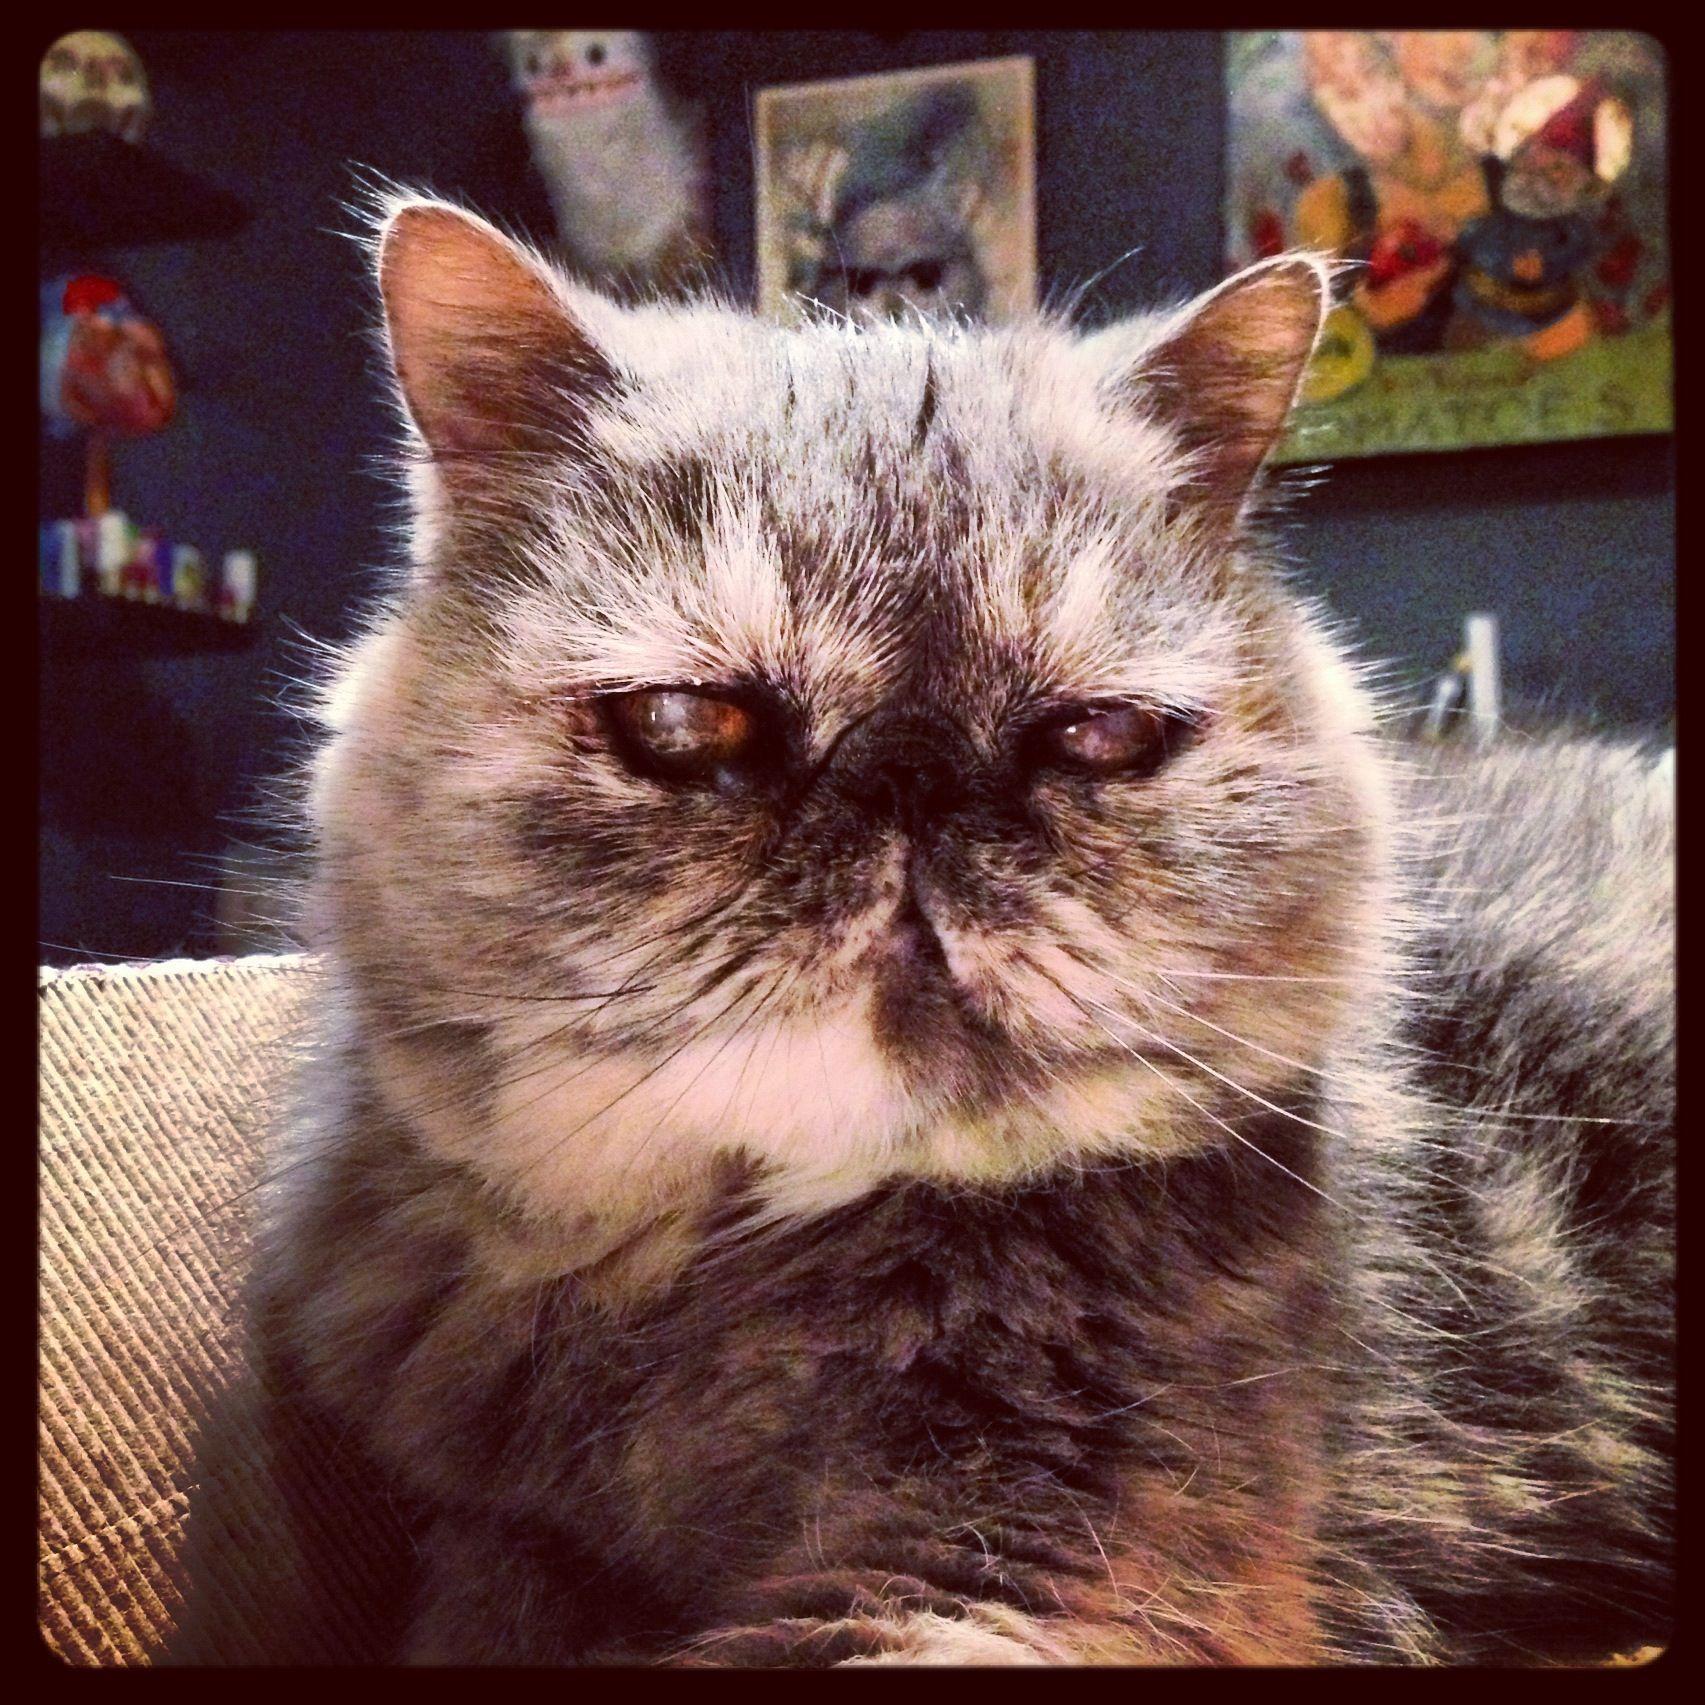 Blue cream exotic shorthair. An epic smushy cat.